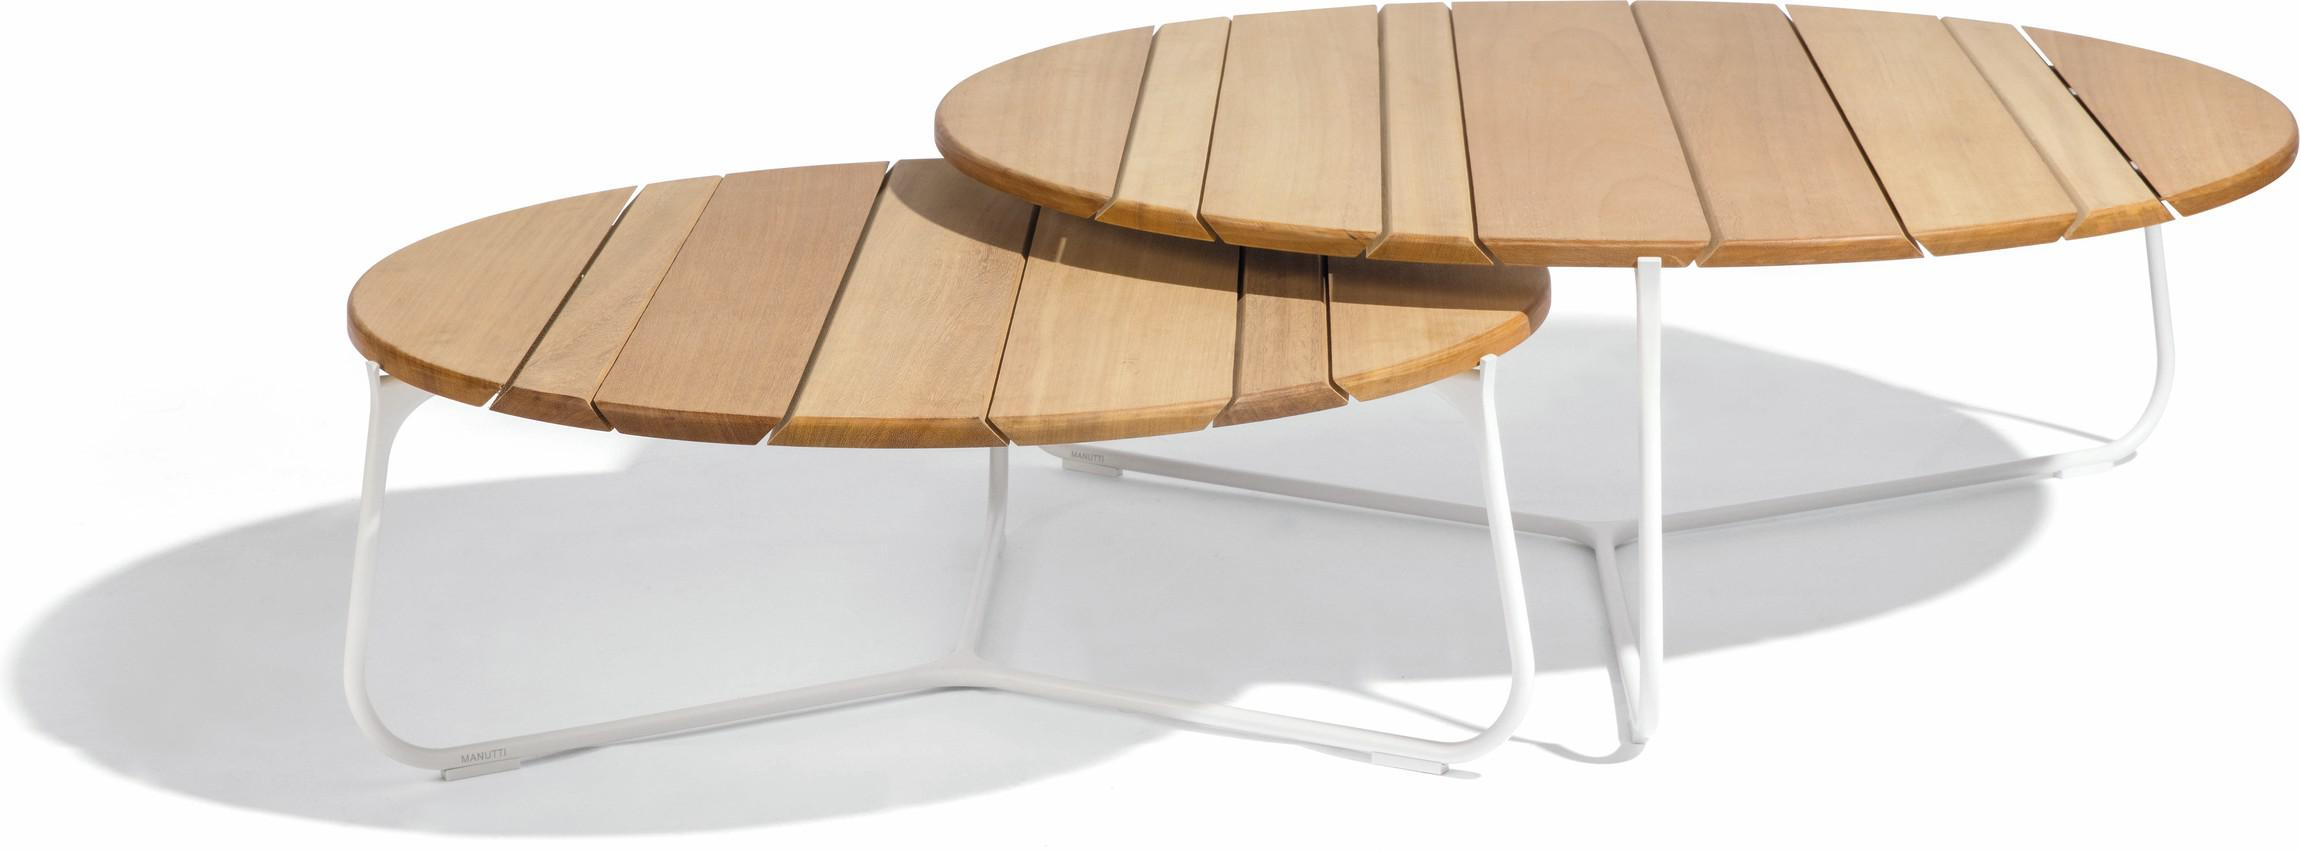 Mood coffee table - white - iroko IR - 80